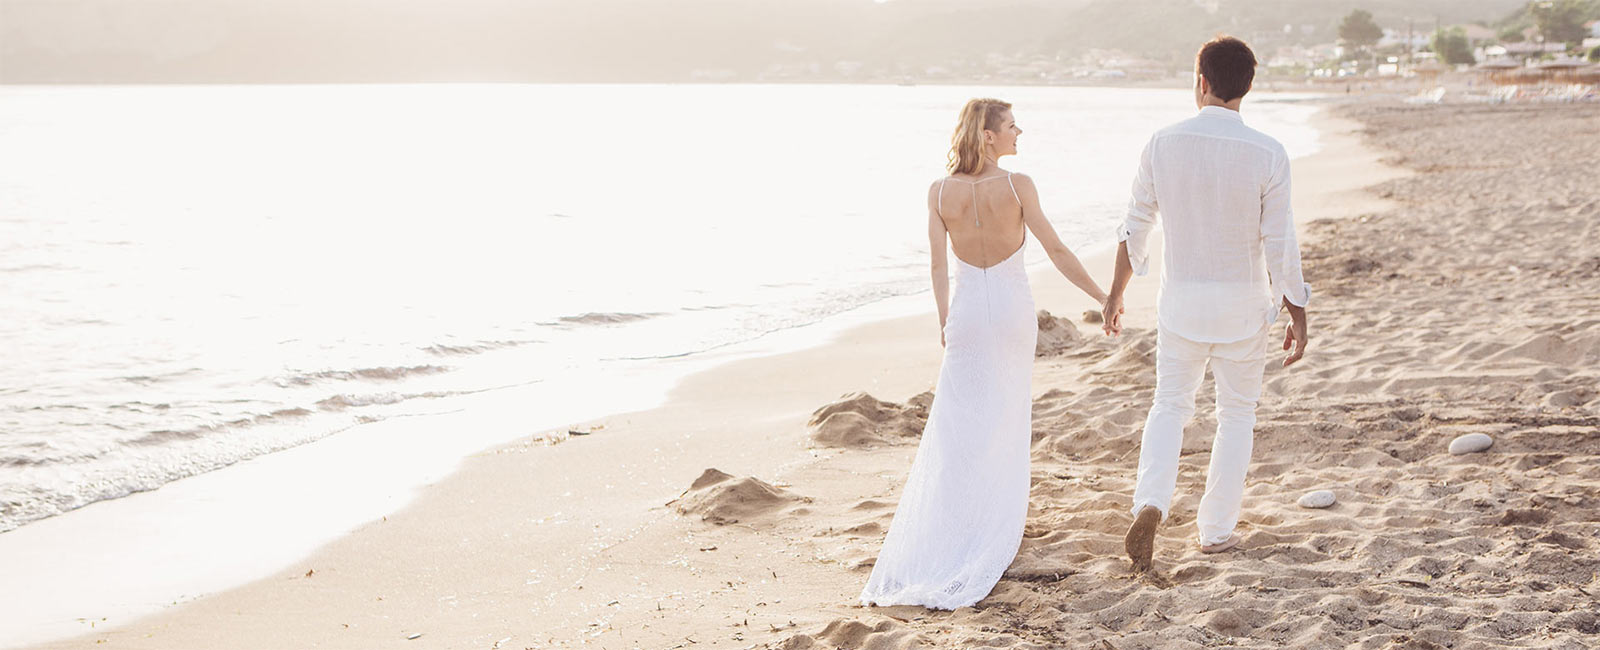 Ehepaar am Strand von Agios Georgios auf Korfu